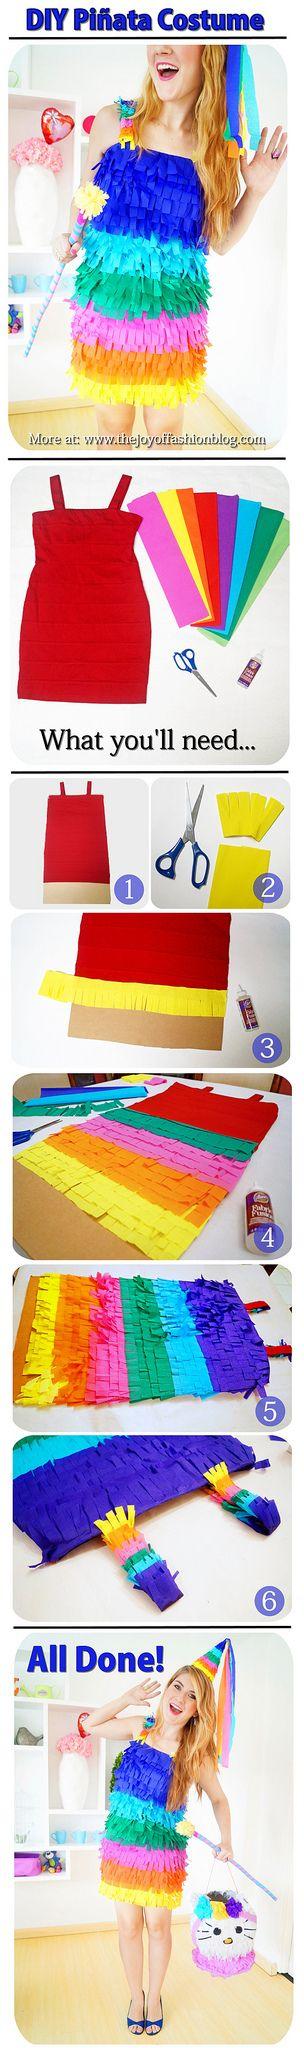 Easy DIY Piñata Costume